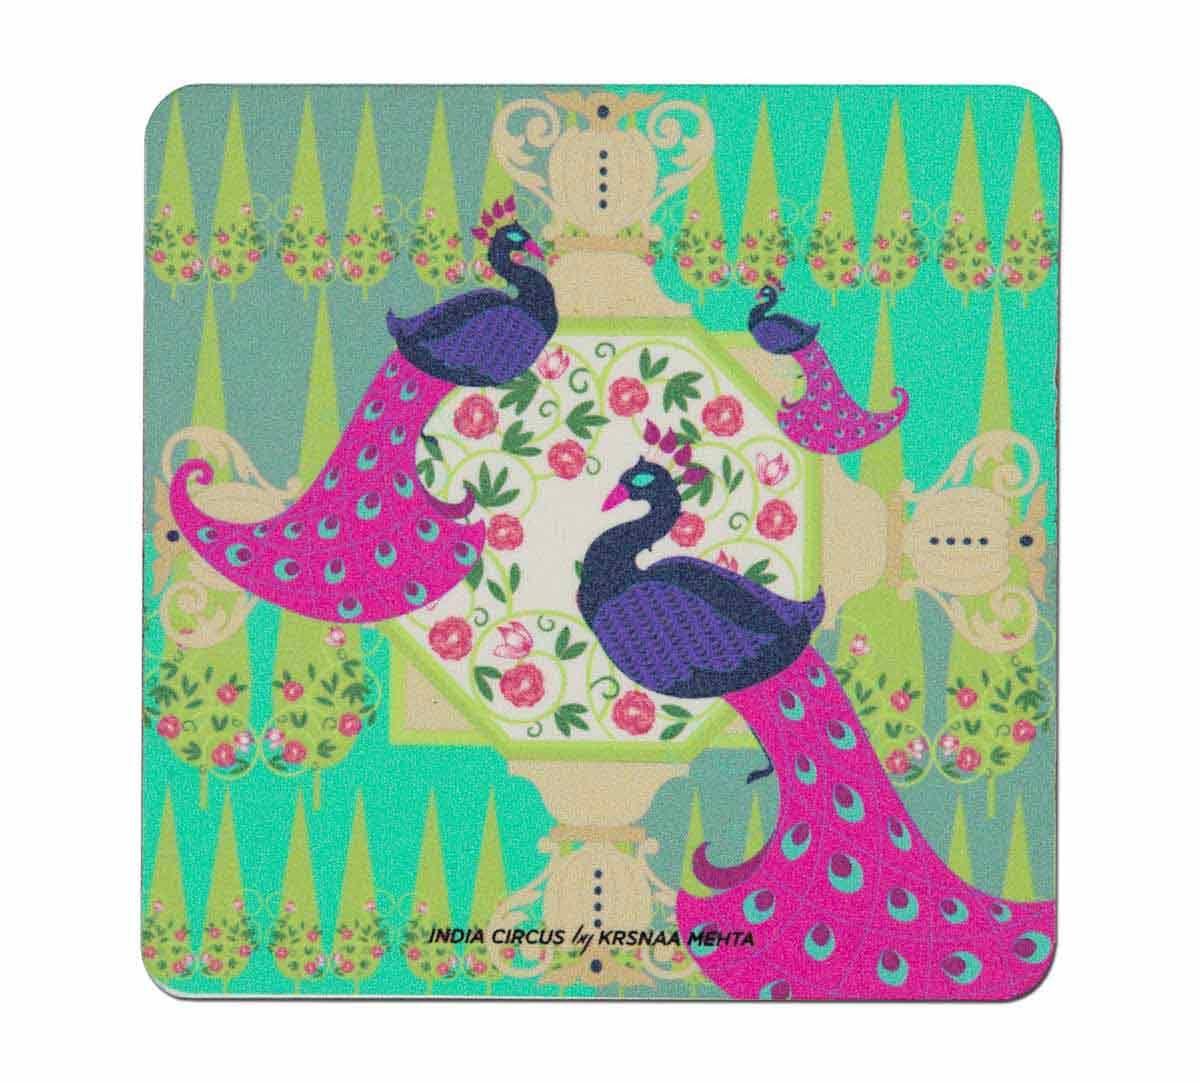 India Circus Peacock Illusion Table Coaster Set of 6